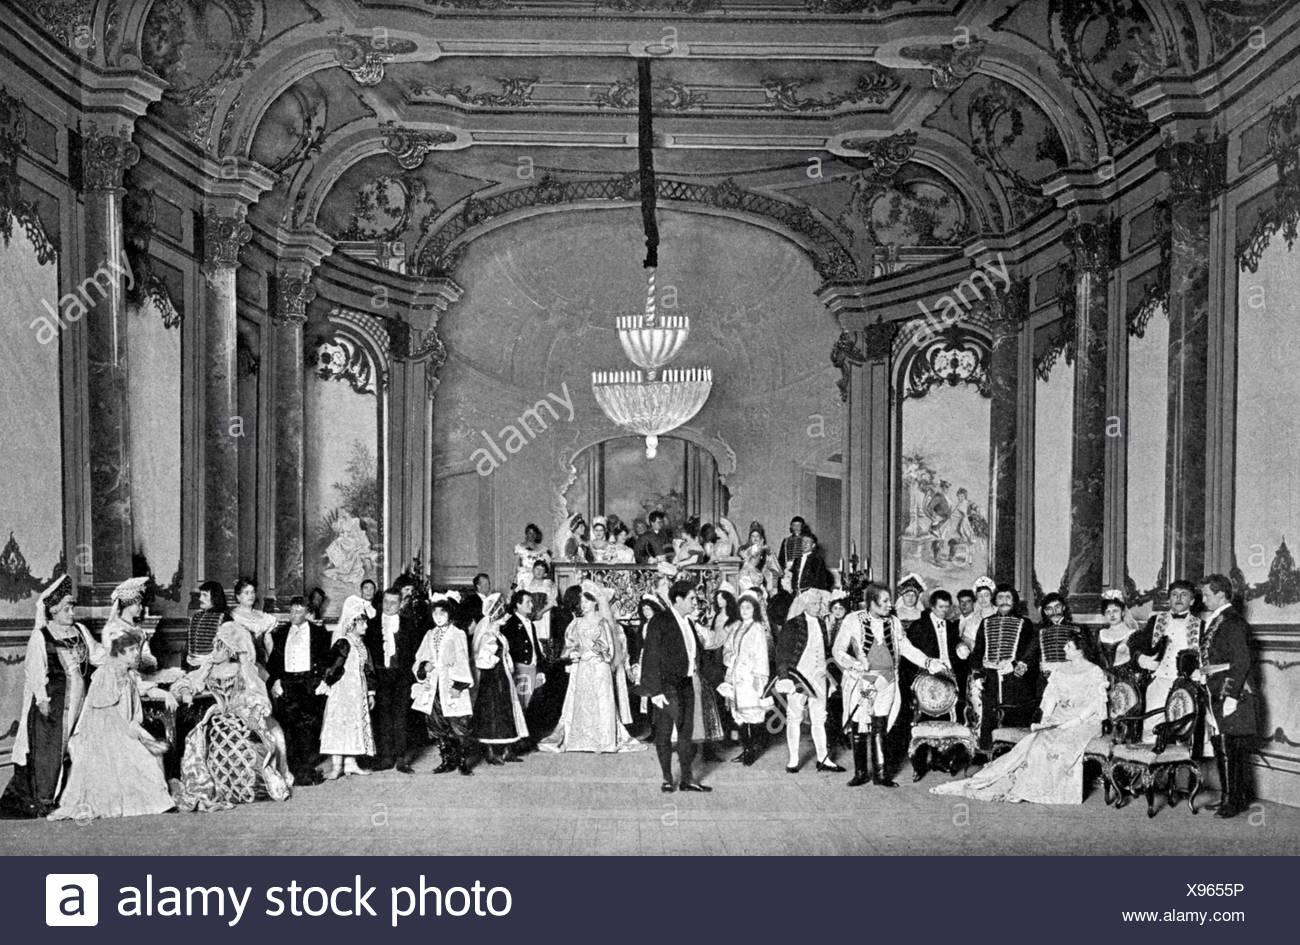 Tchaikovsky, Pyotr Ilyich, 7.5.1840 - 6.11.1893, Russian composer, opera 'Eugene Onegin', 1881, scene, performance, Theater des Stockbild